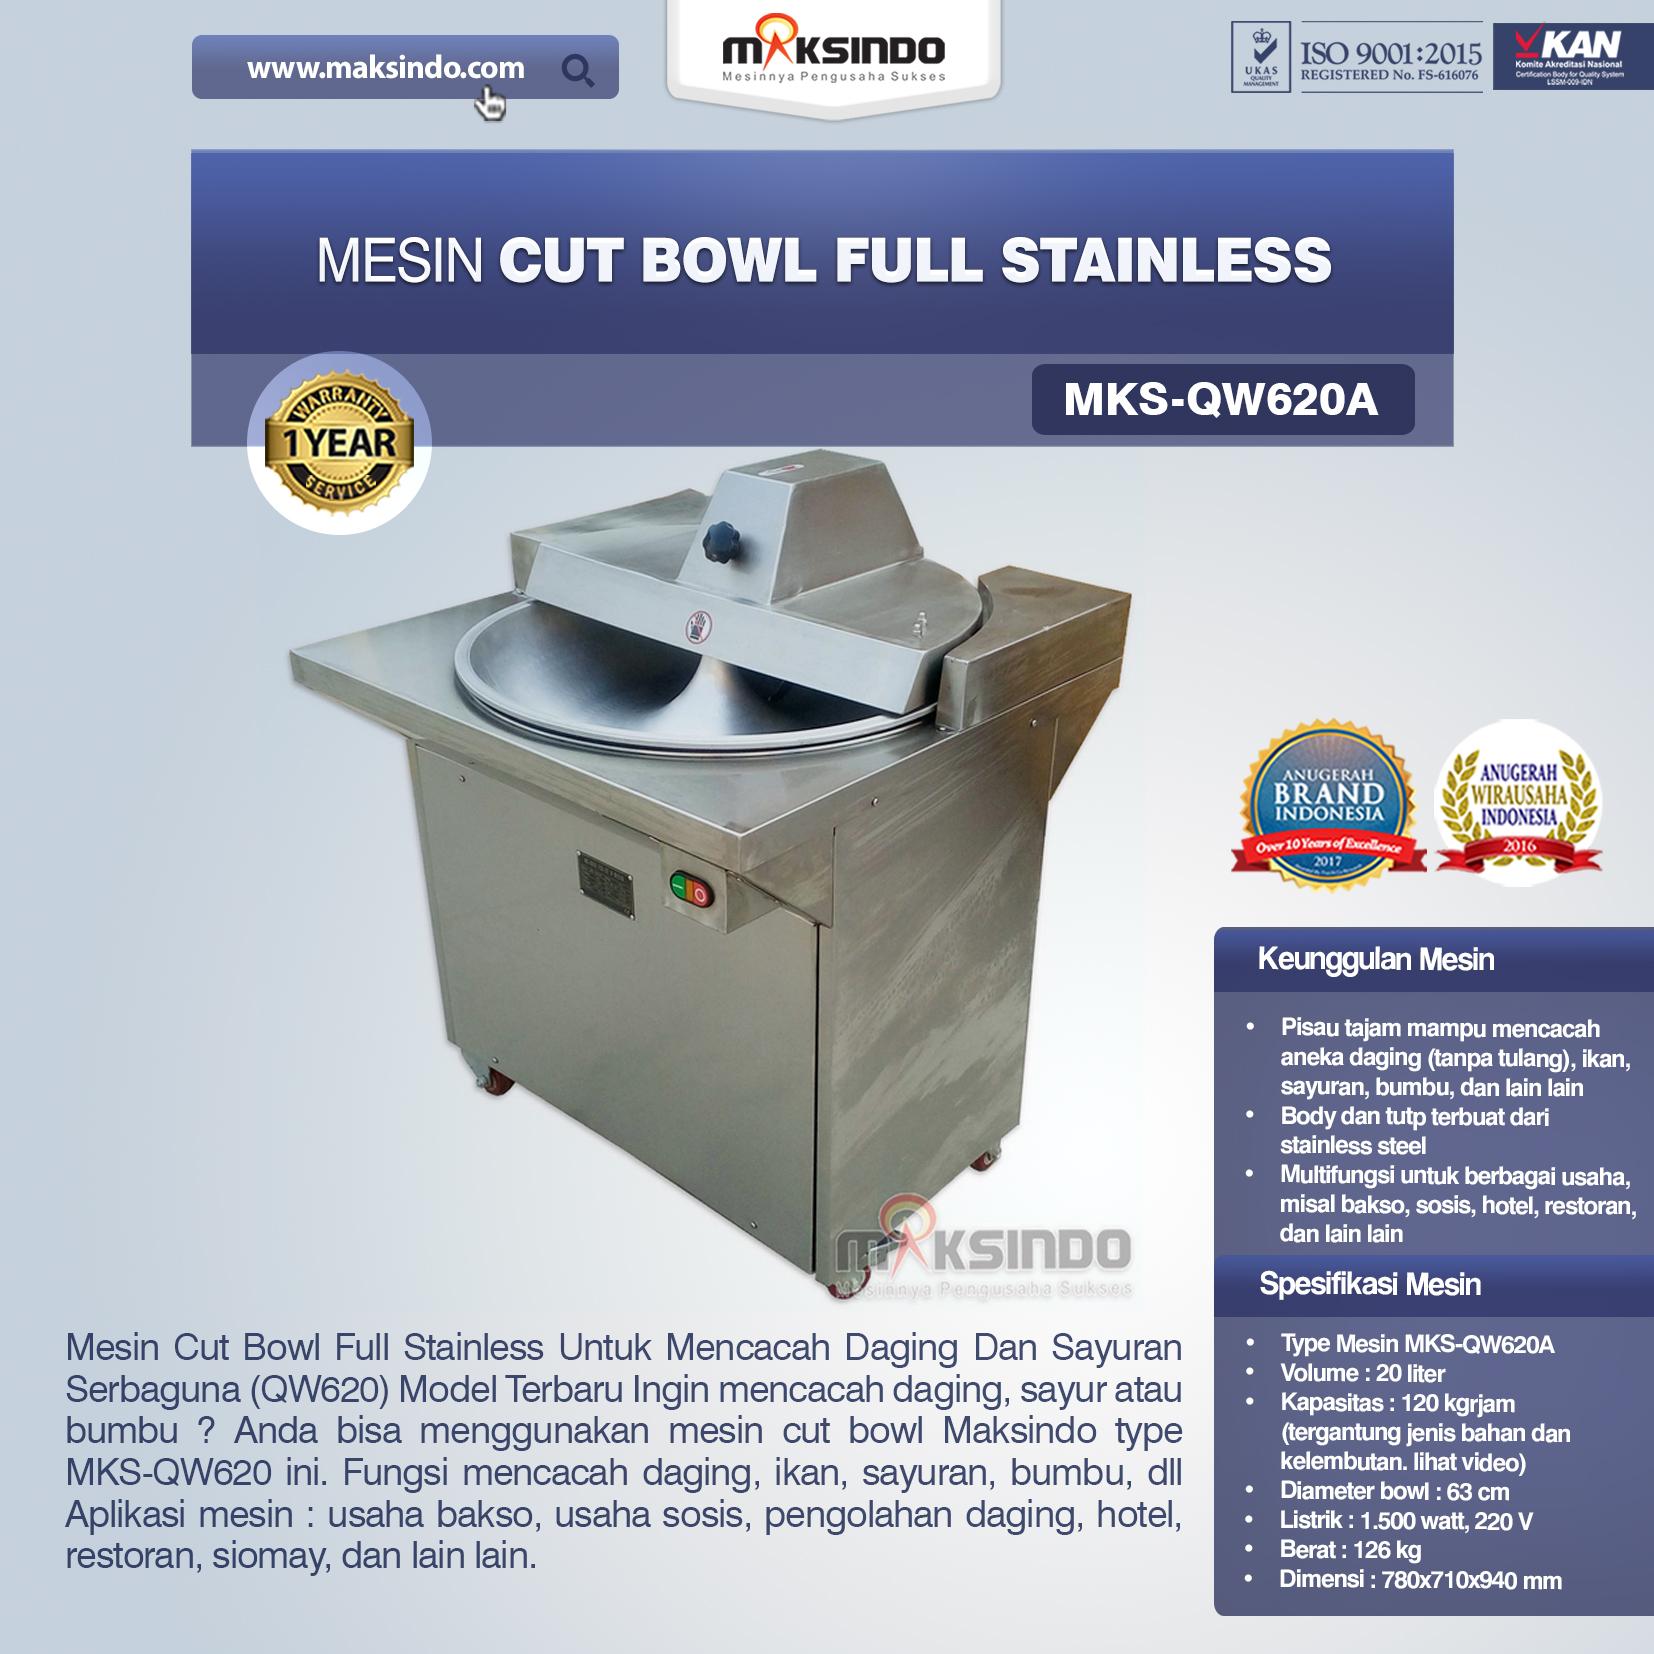 Jual Mesin Cut Bowl Full Stainless (QW620A) di Jakarta